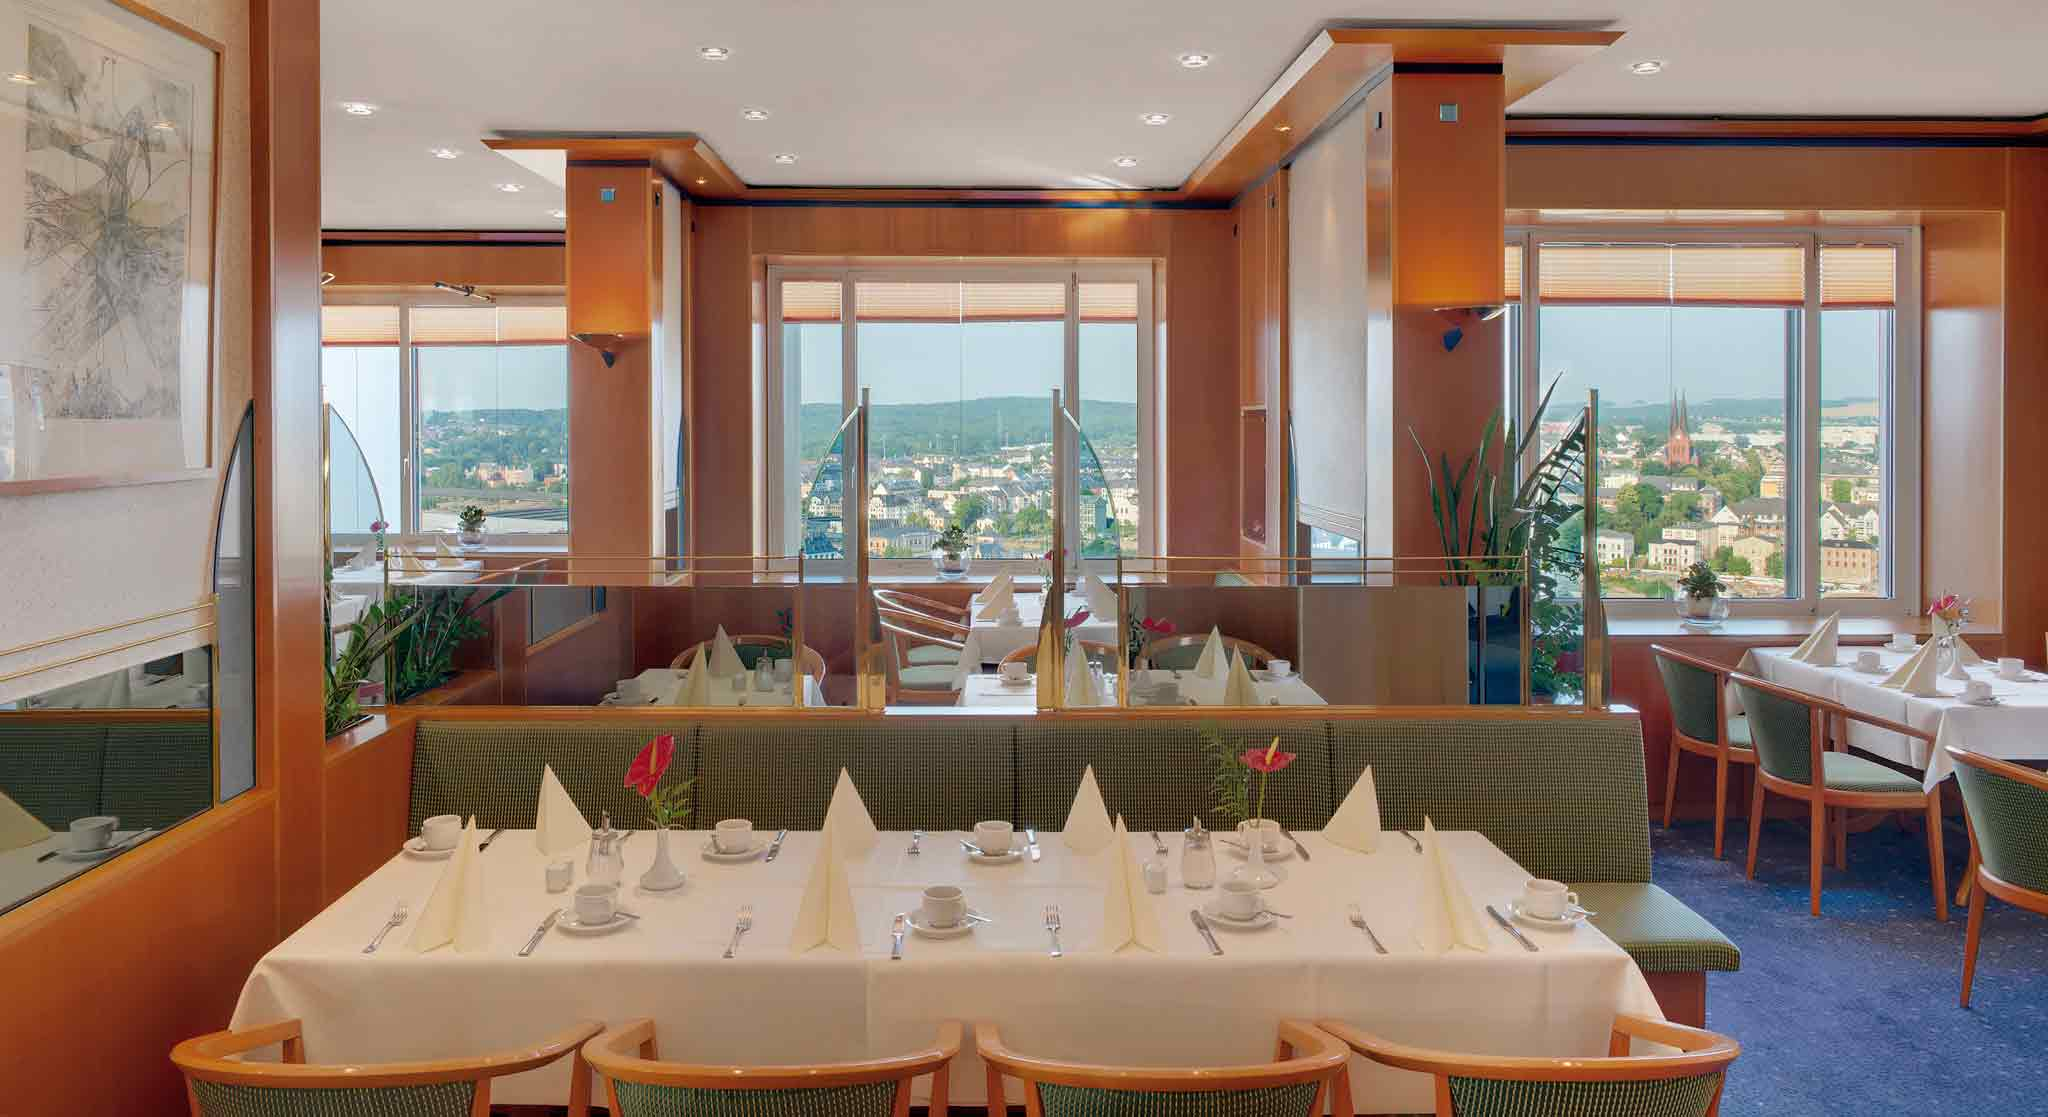 Mercure Hotel Kongress Chemnitz Gastronomie